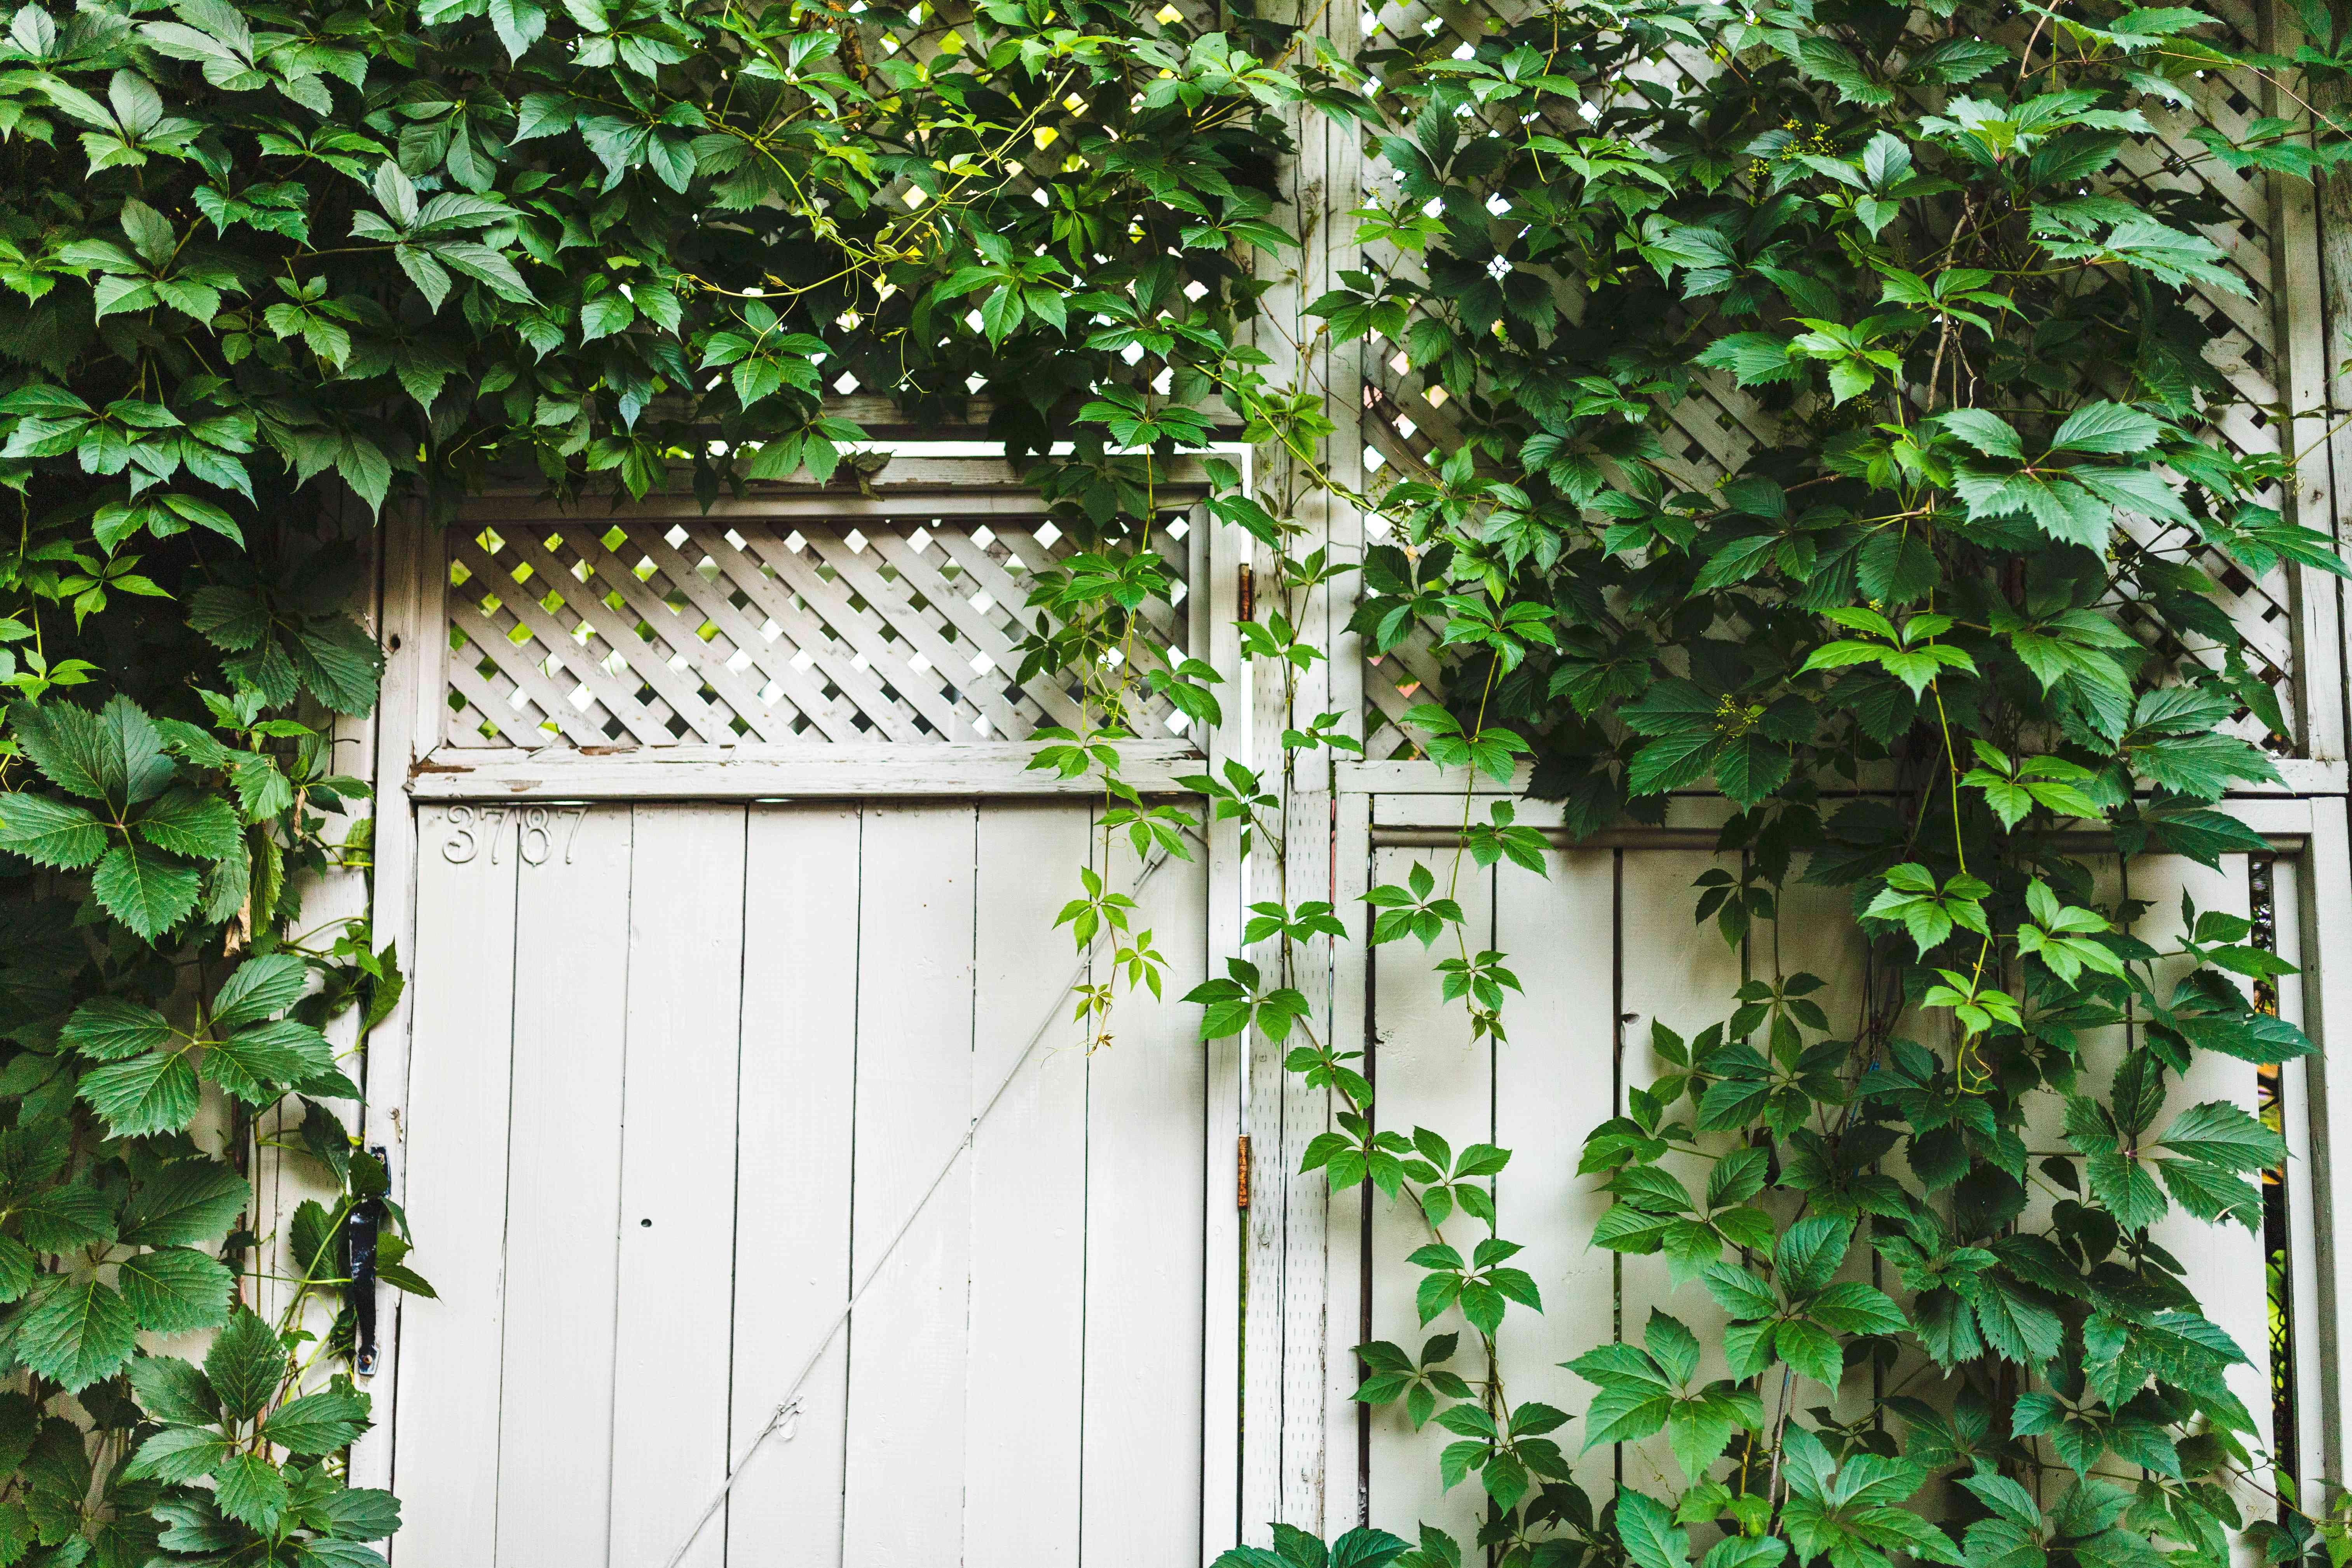 Virginia Creeper on a fence